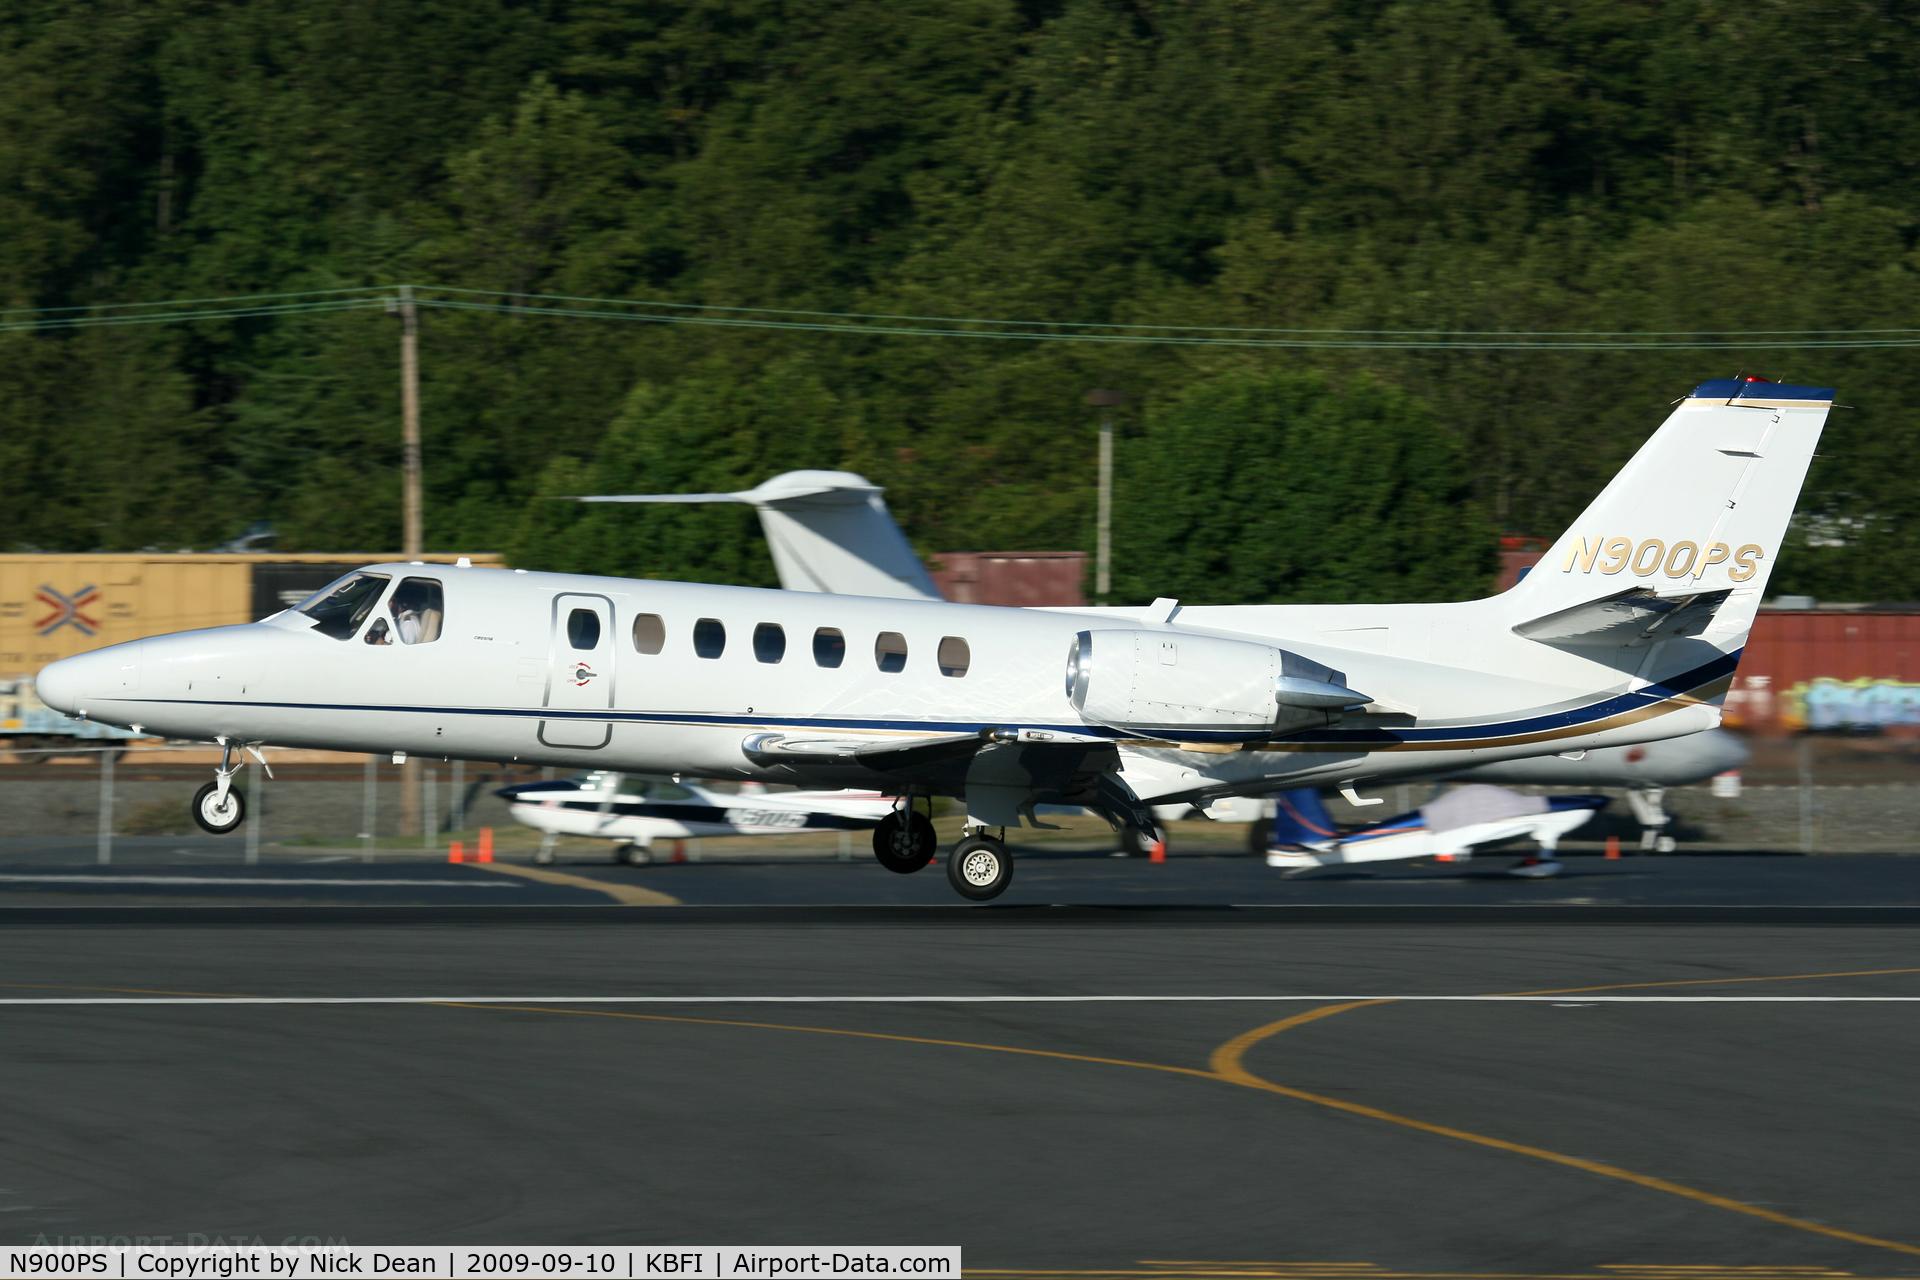 N900PS, 1991 Cessna 560 Citation V C/N 560-0118, KBFI